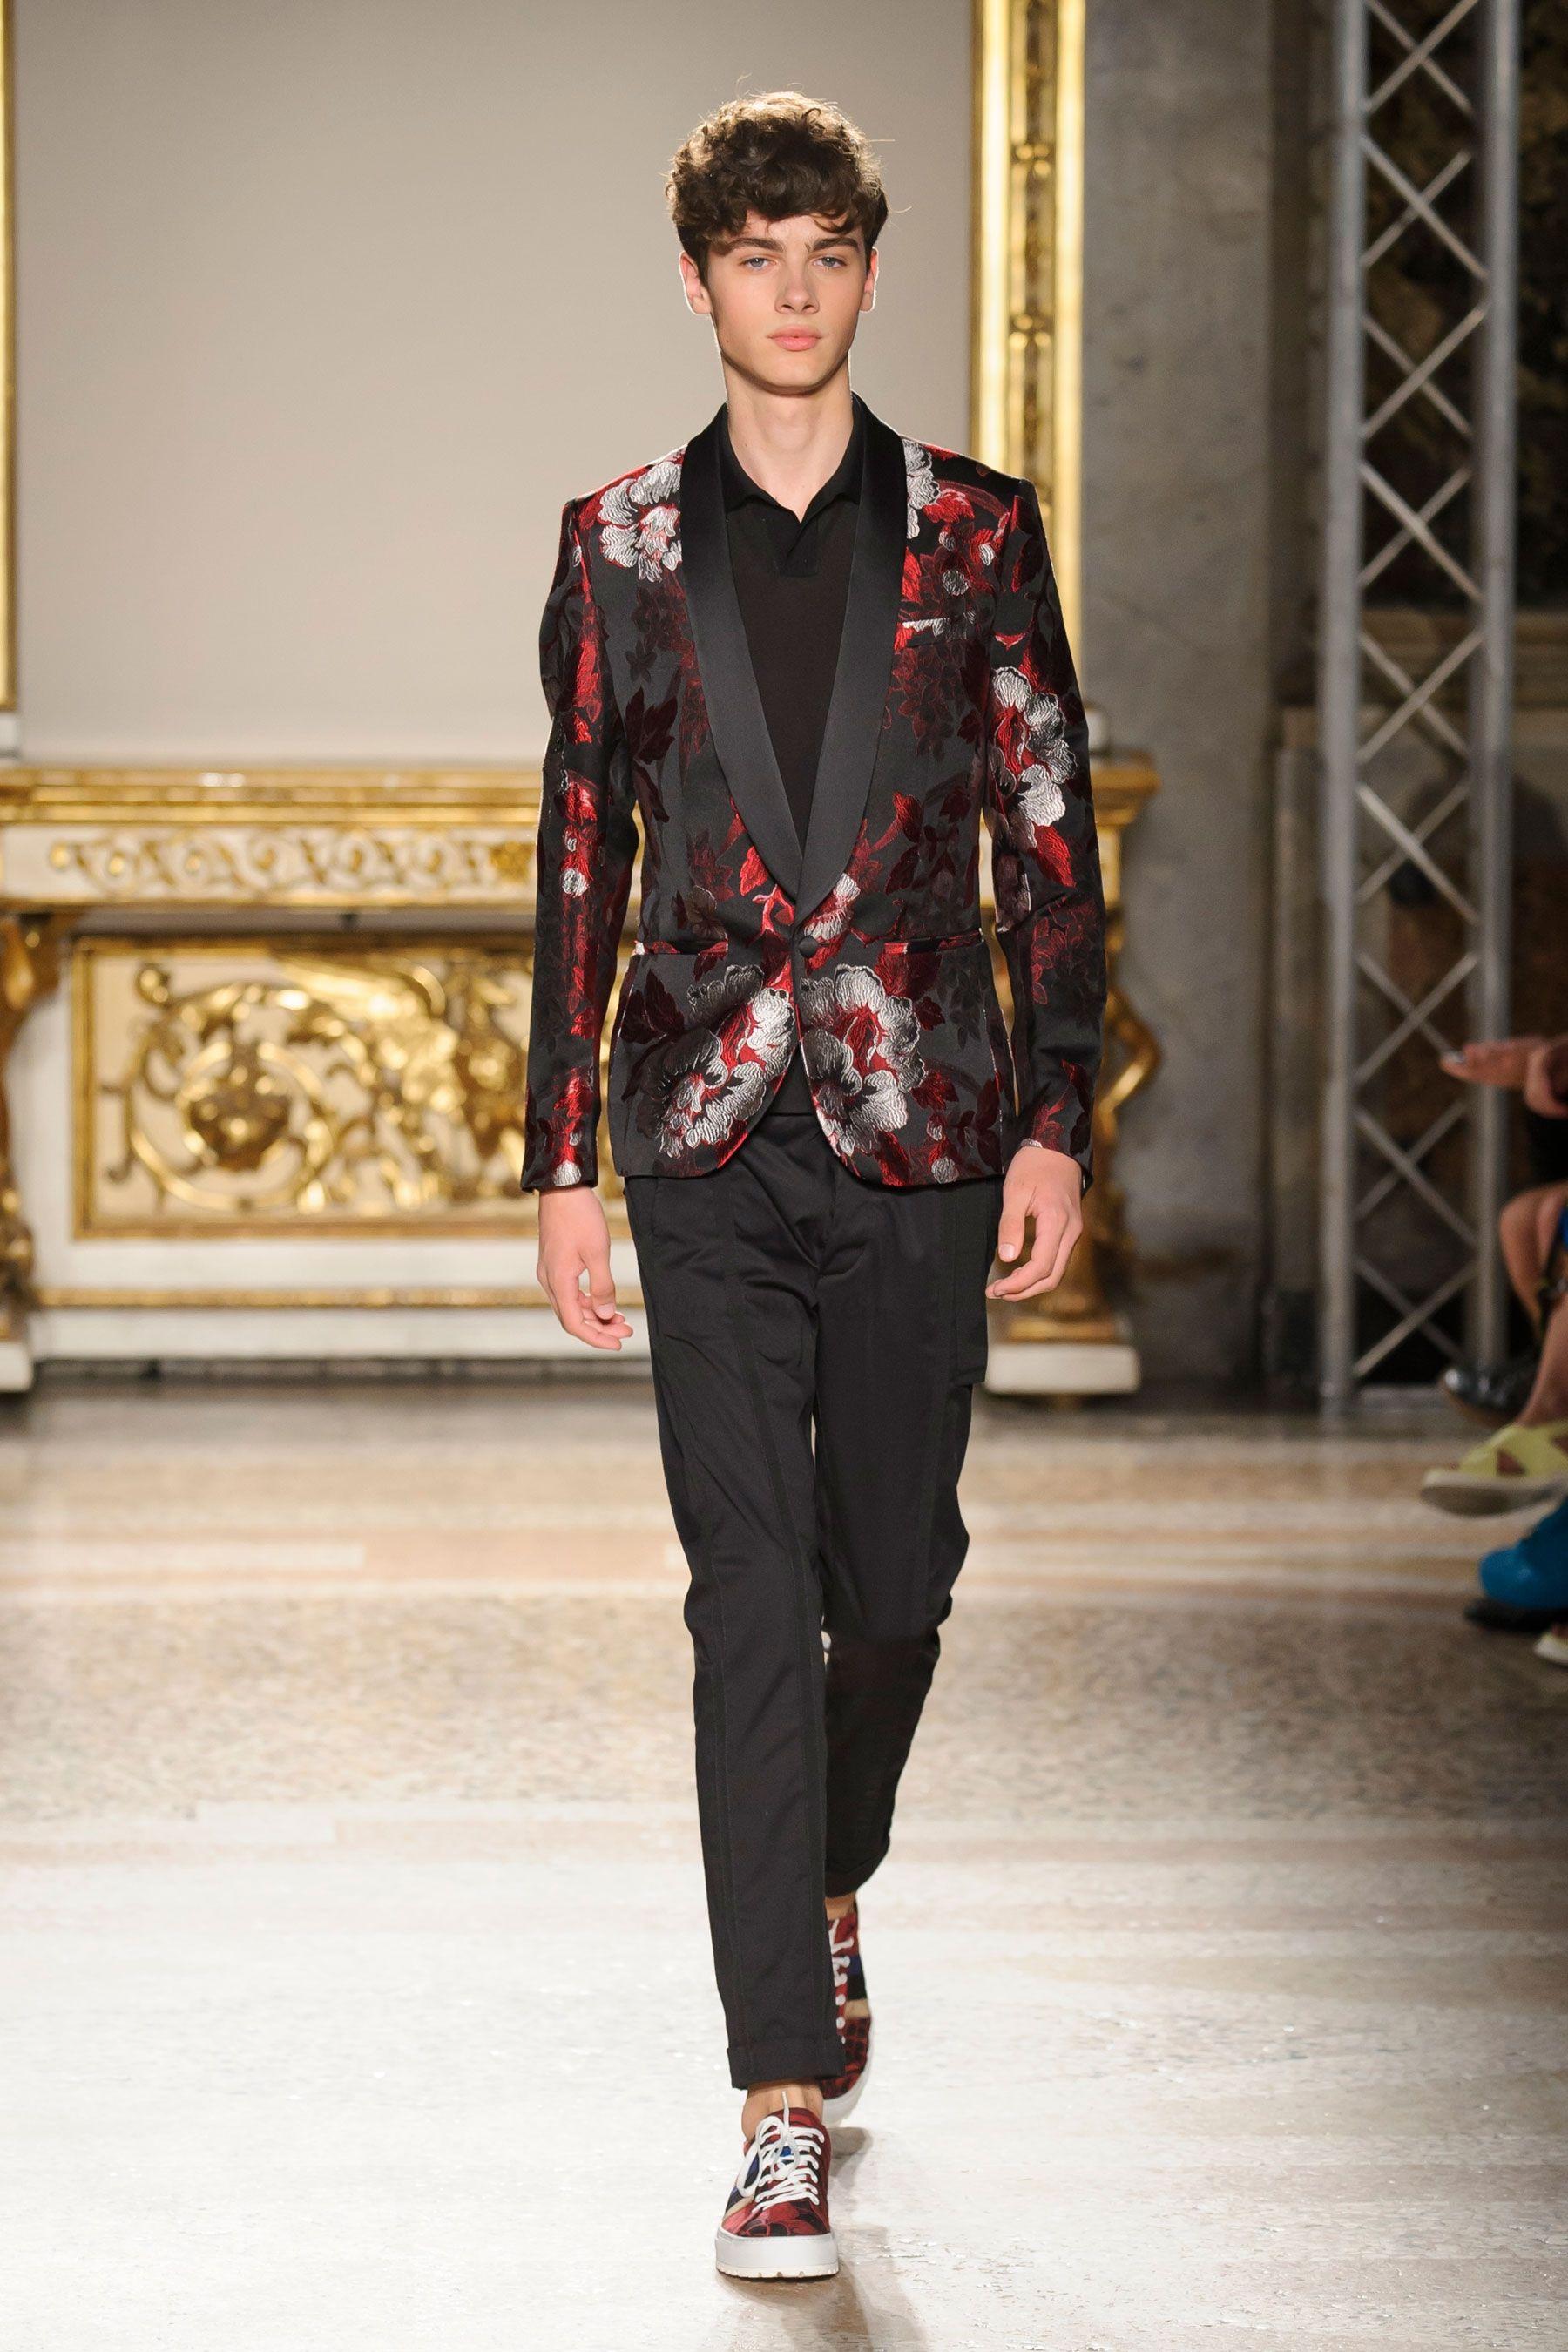 Chirstian Pellizzari Spring Summer 2016 Collection Primavera Verano #Menswear #Trends #Tendencias #Moda Hombre Milan Fashion Week - D.P.